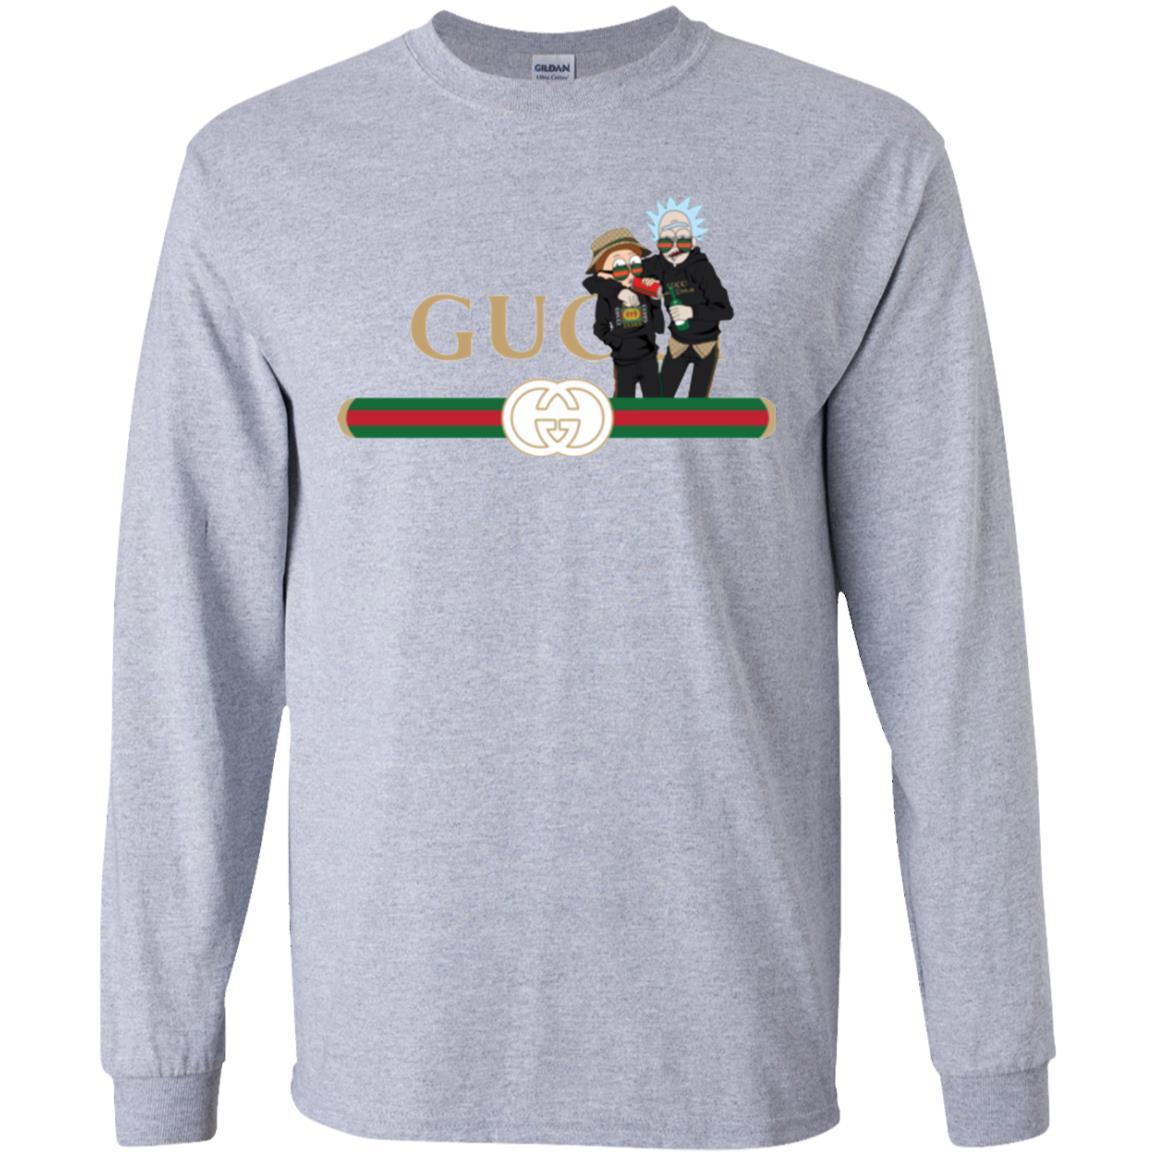 image 217px Rick and Morty Gucci Mashup T shirts, Hoodies, Tank